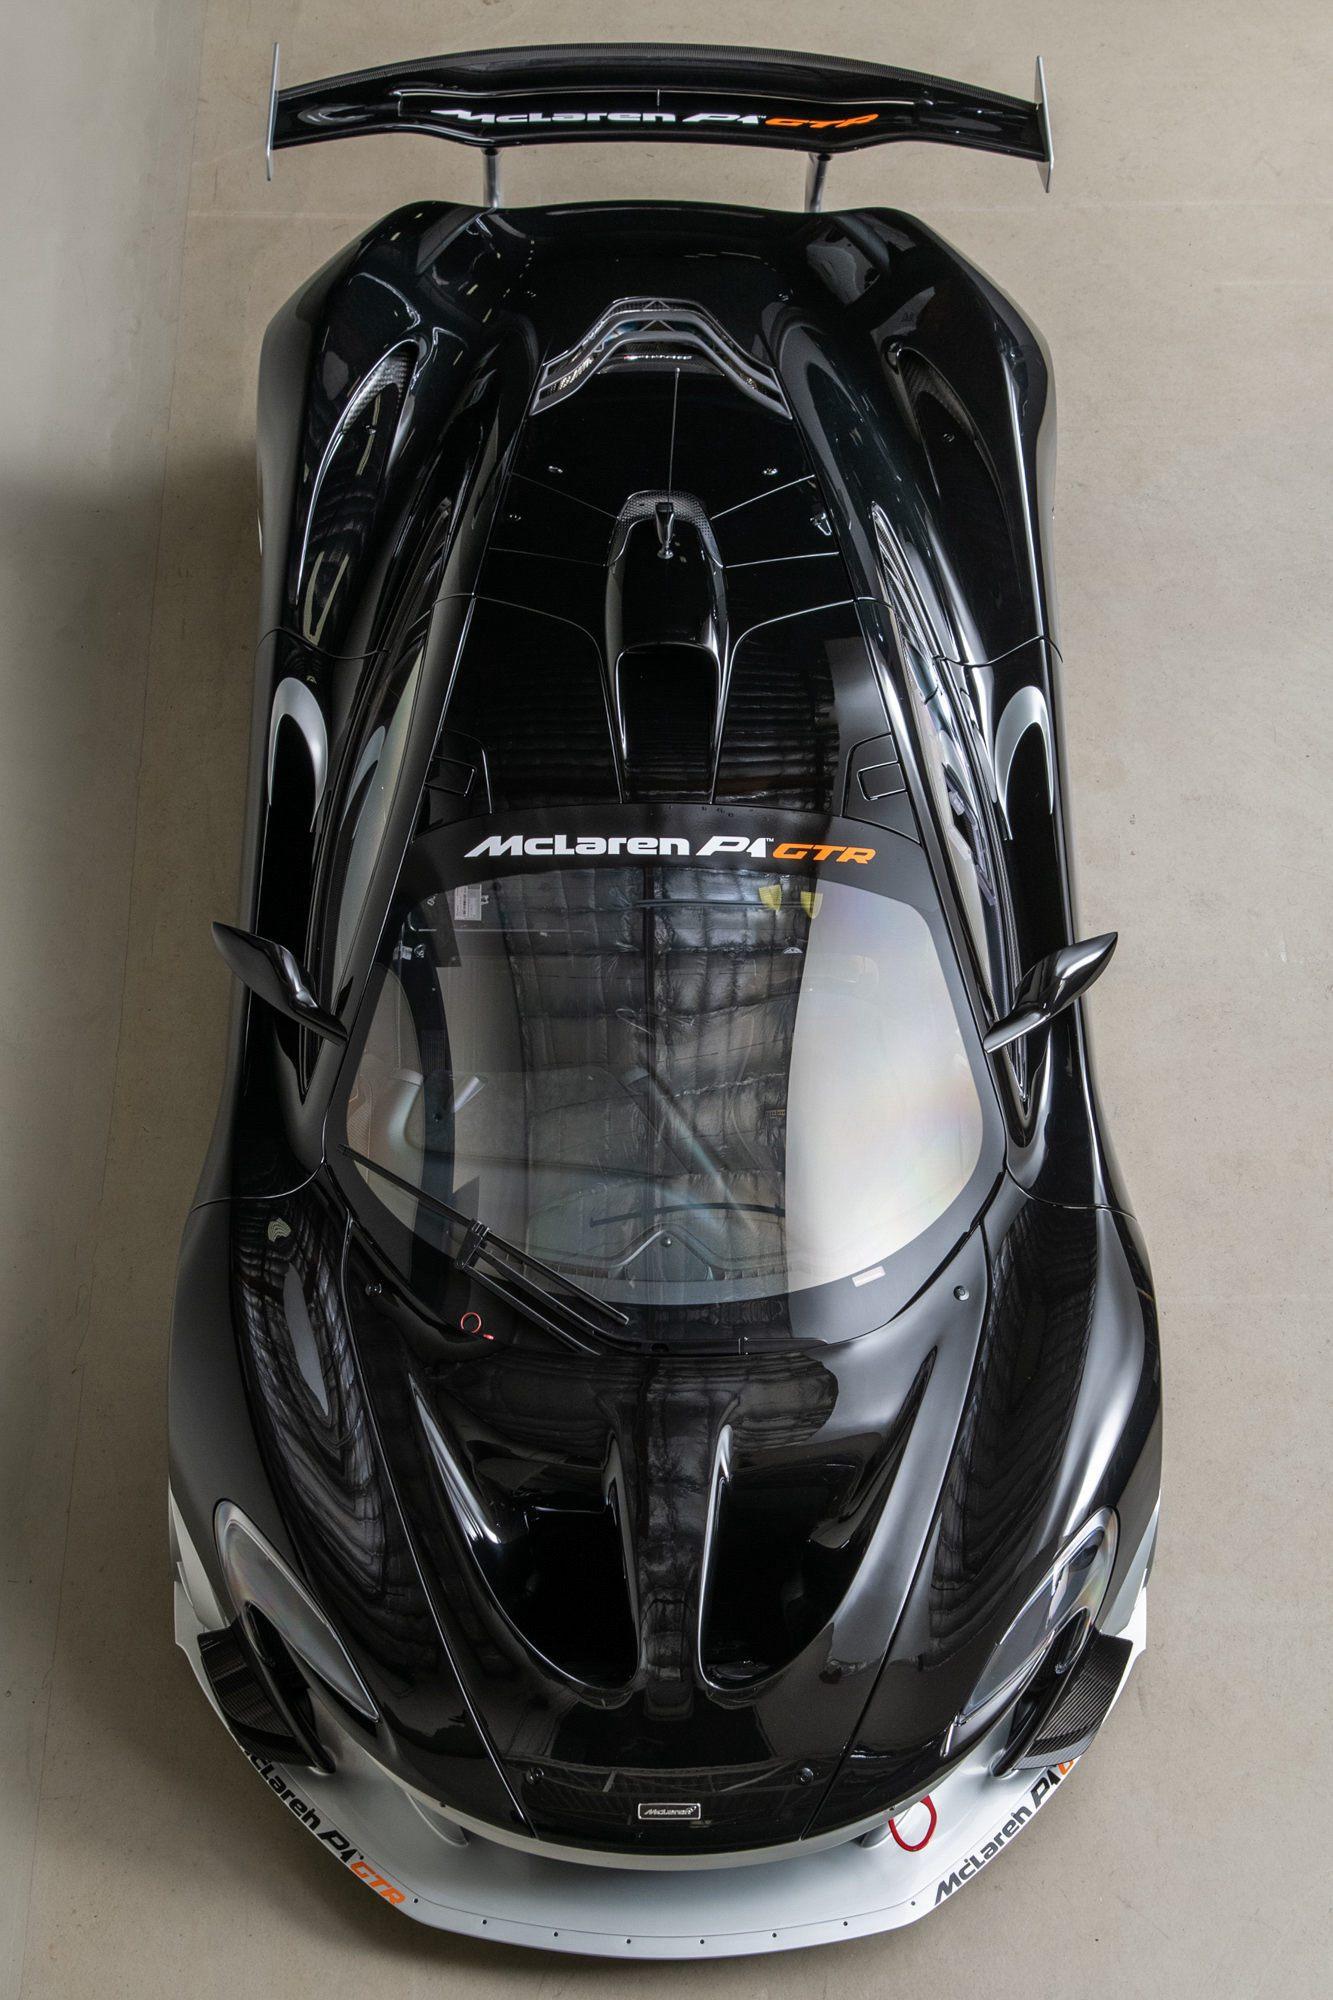 McLaren_P1_GTR_sale_0055